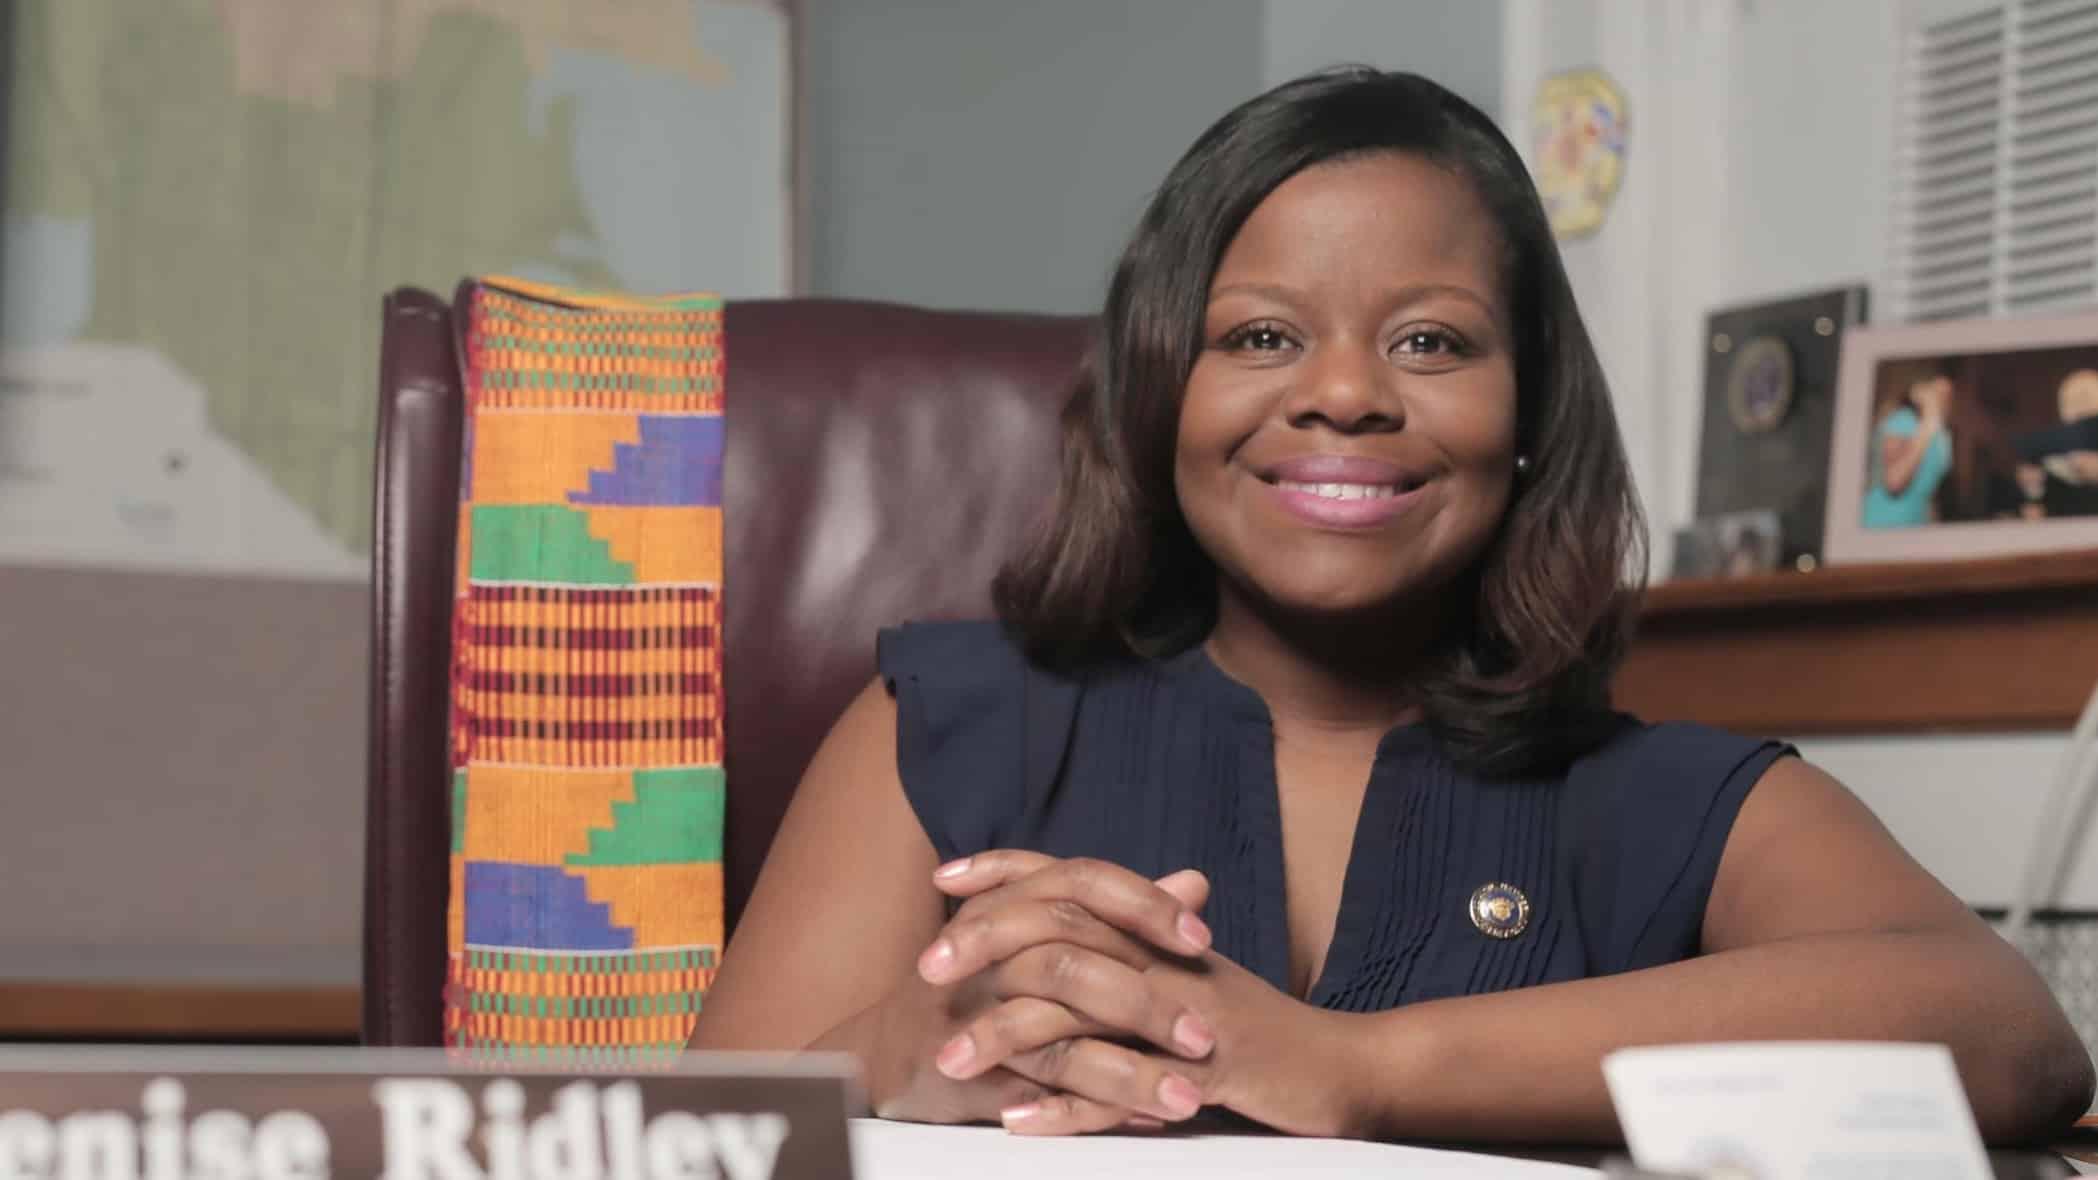 Jersey City Councilwoman Denise Ridley